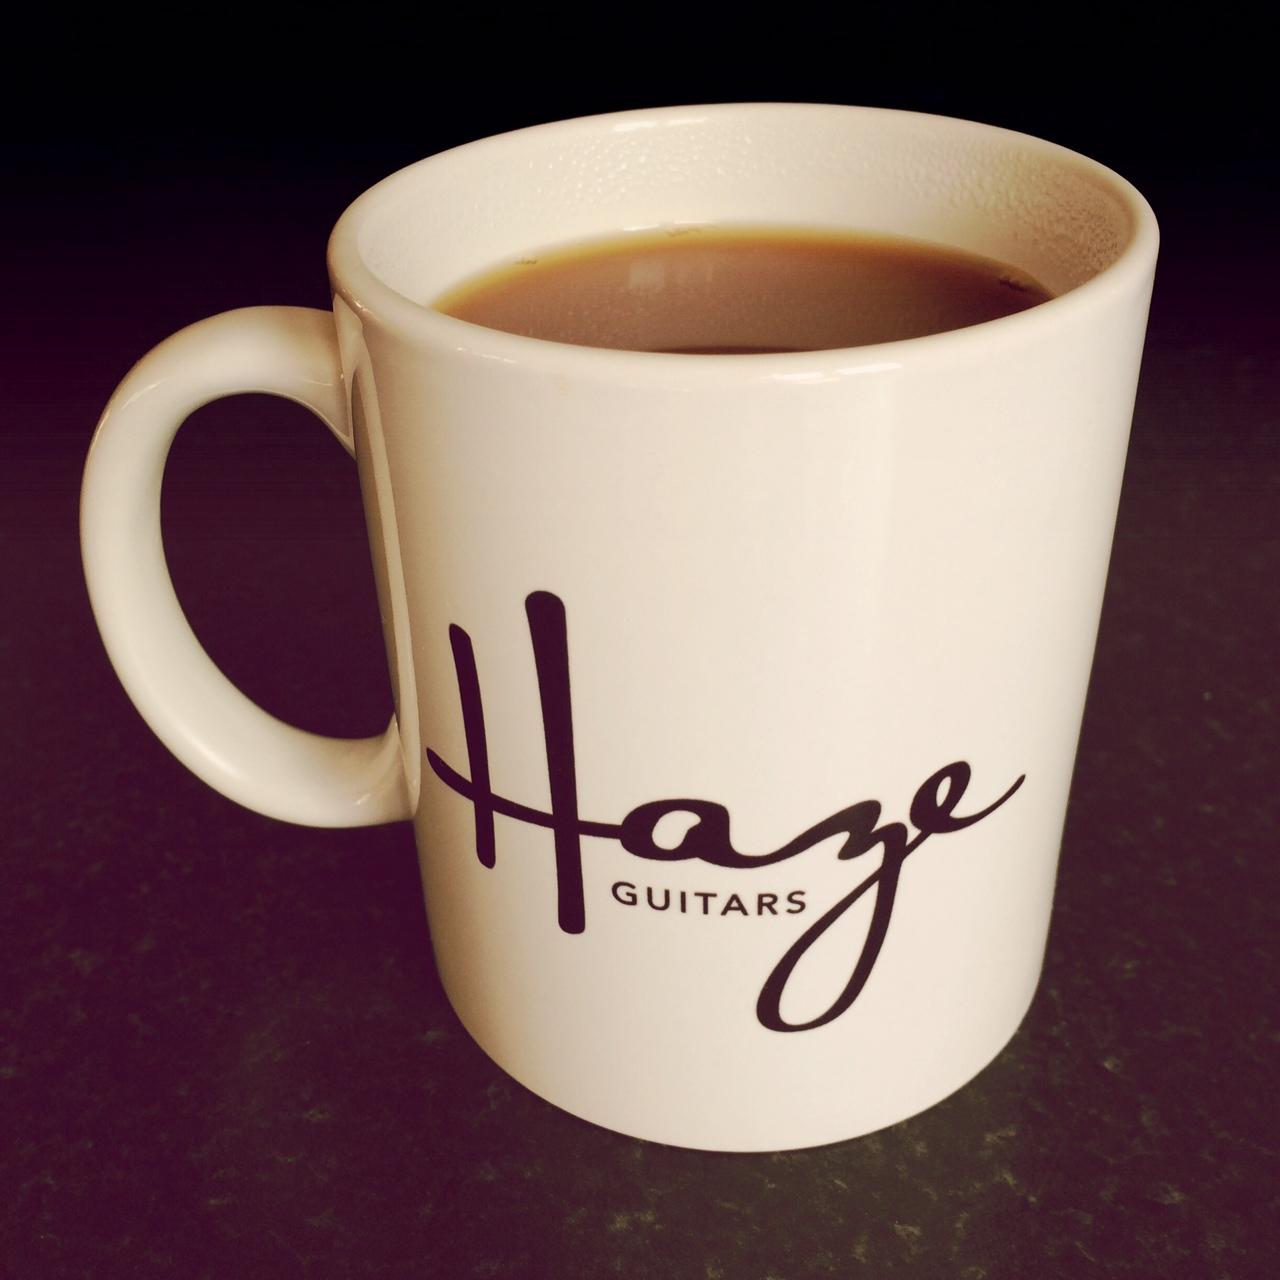 Serving Suggestion: Proper, strong, tea.